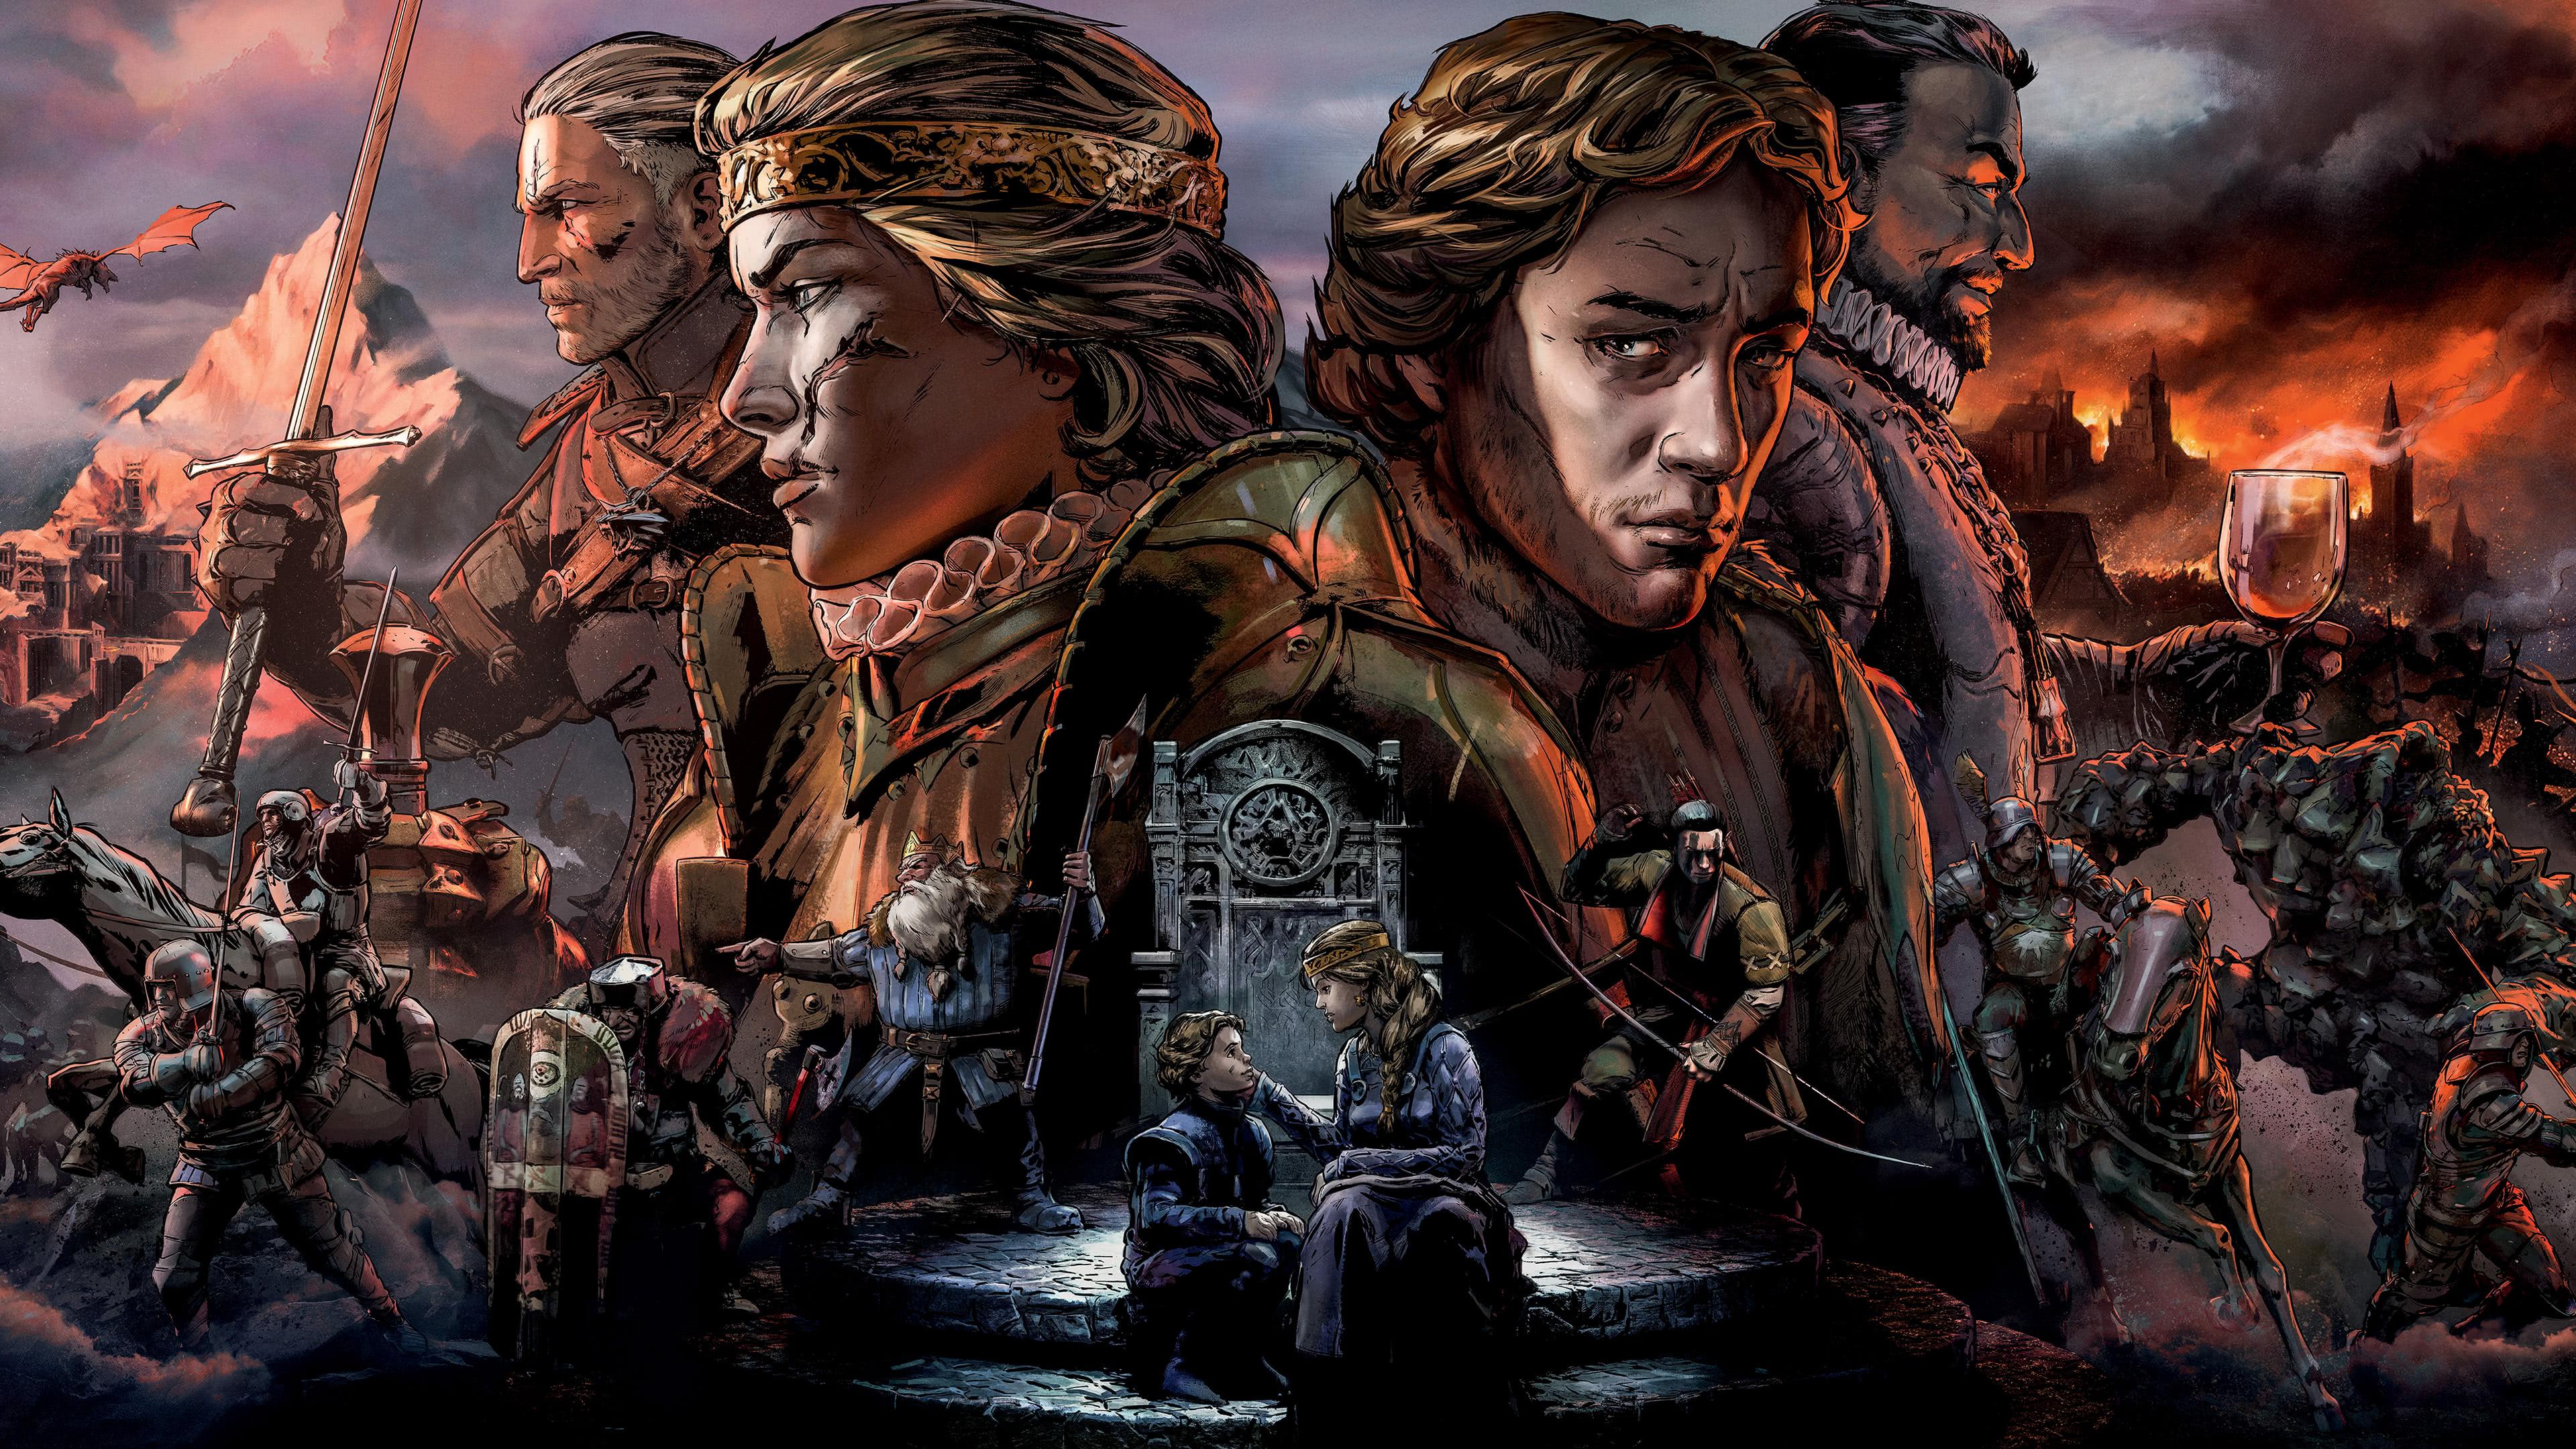 Thronebreaker The Witcher Tales Uhd 4k Wallpaper Gilded Wallpapers